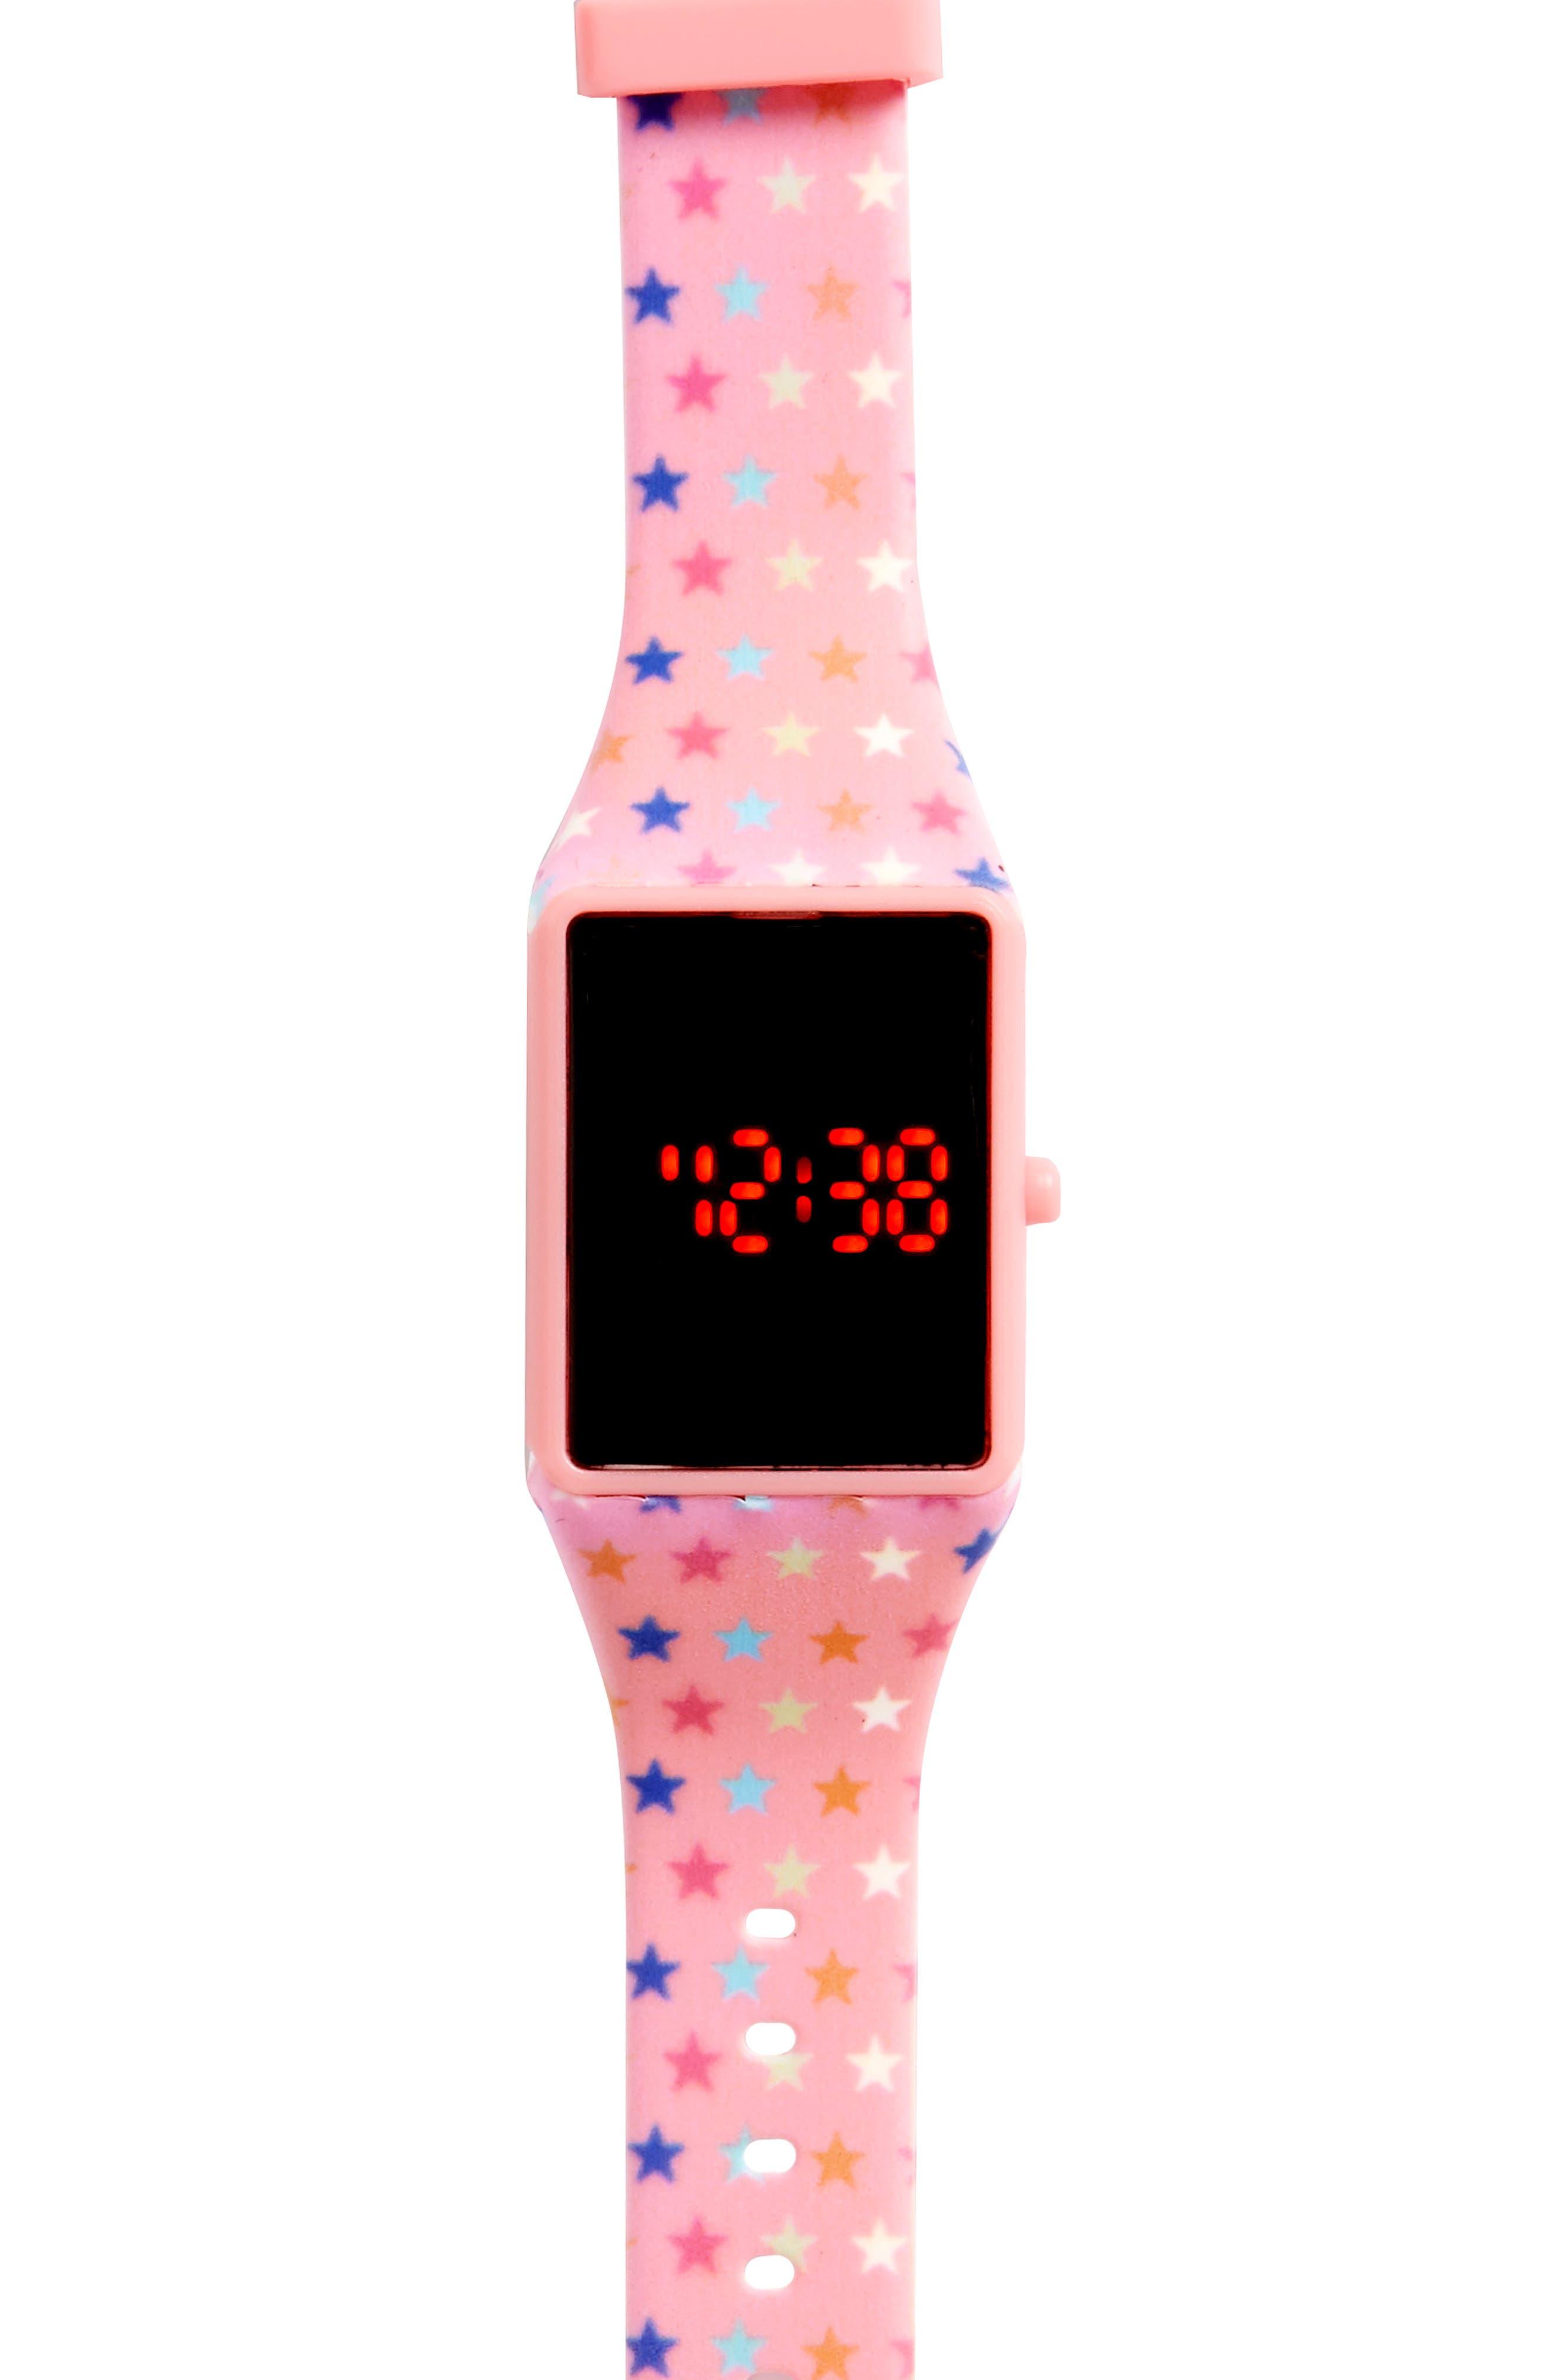 TITANIUM Touchscreen LED Watch